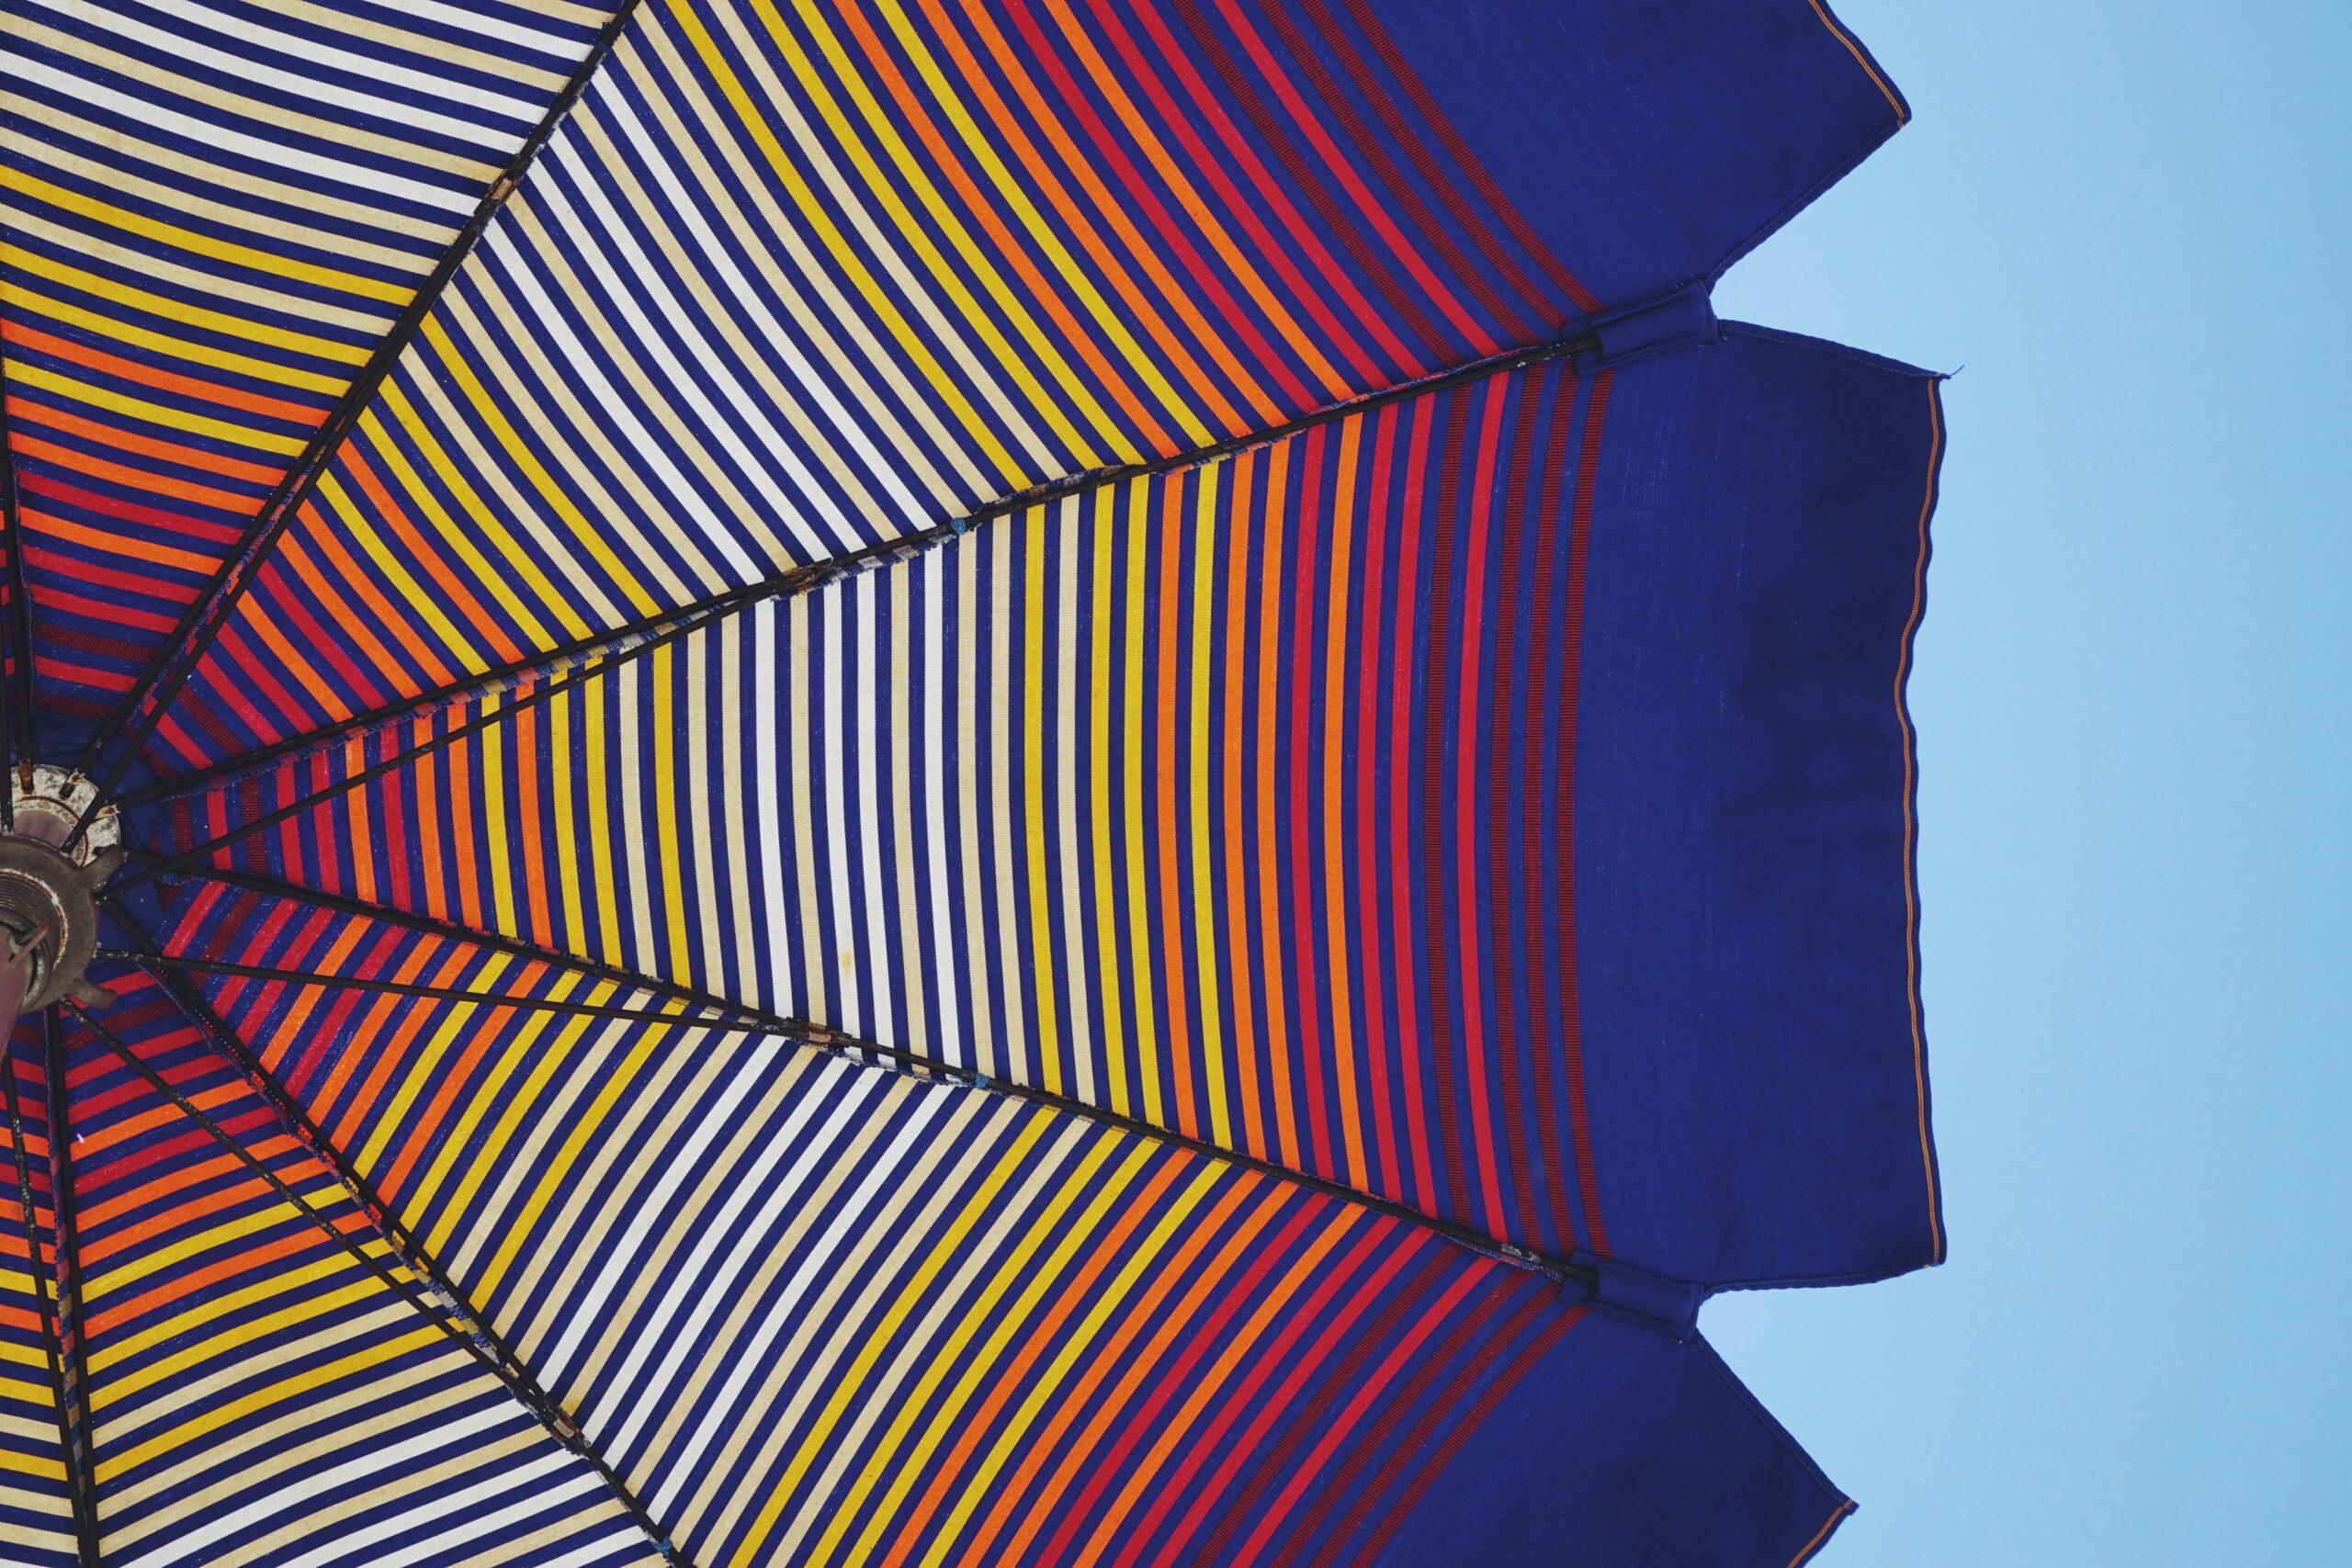 Sonneschutz: Bunter Sonnenschirm vor blauem Himmel